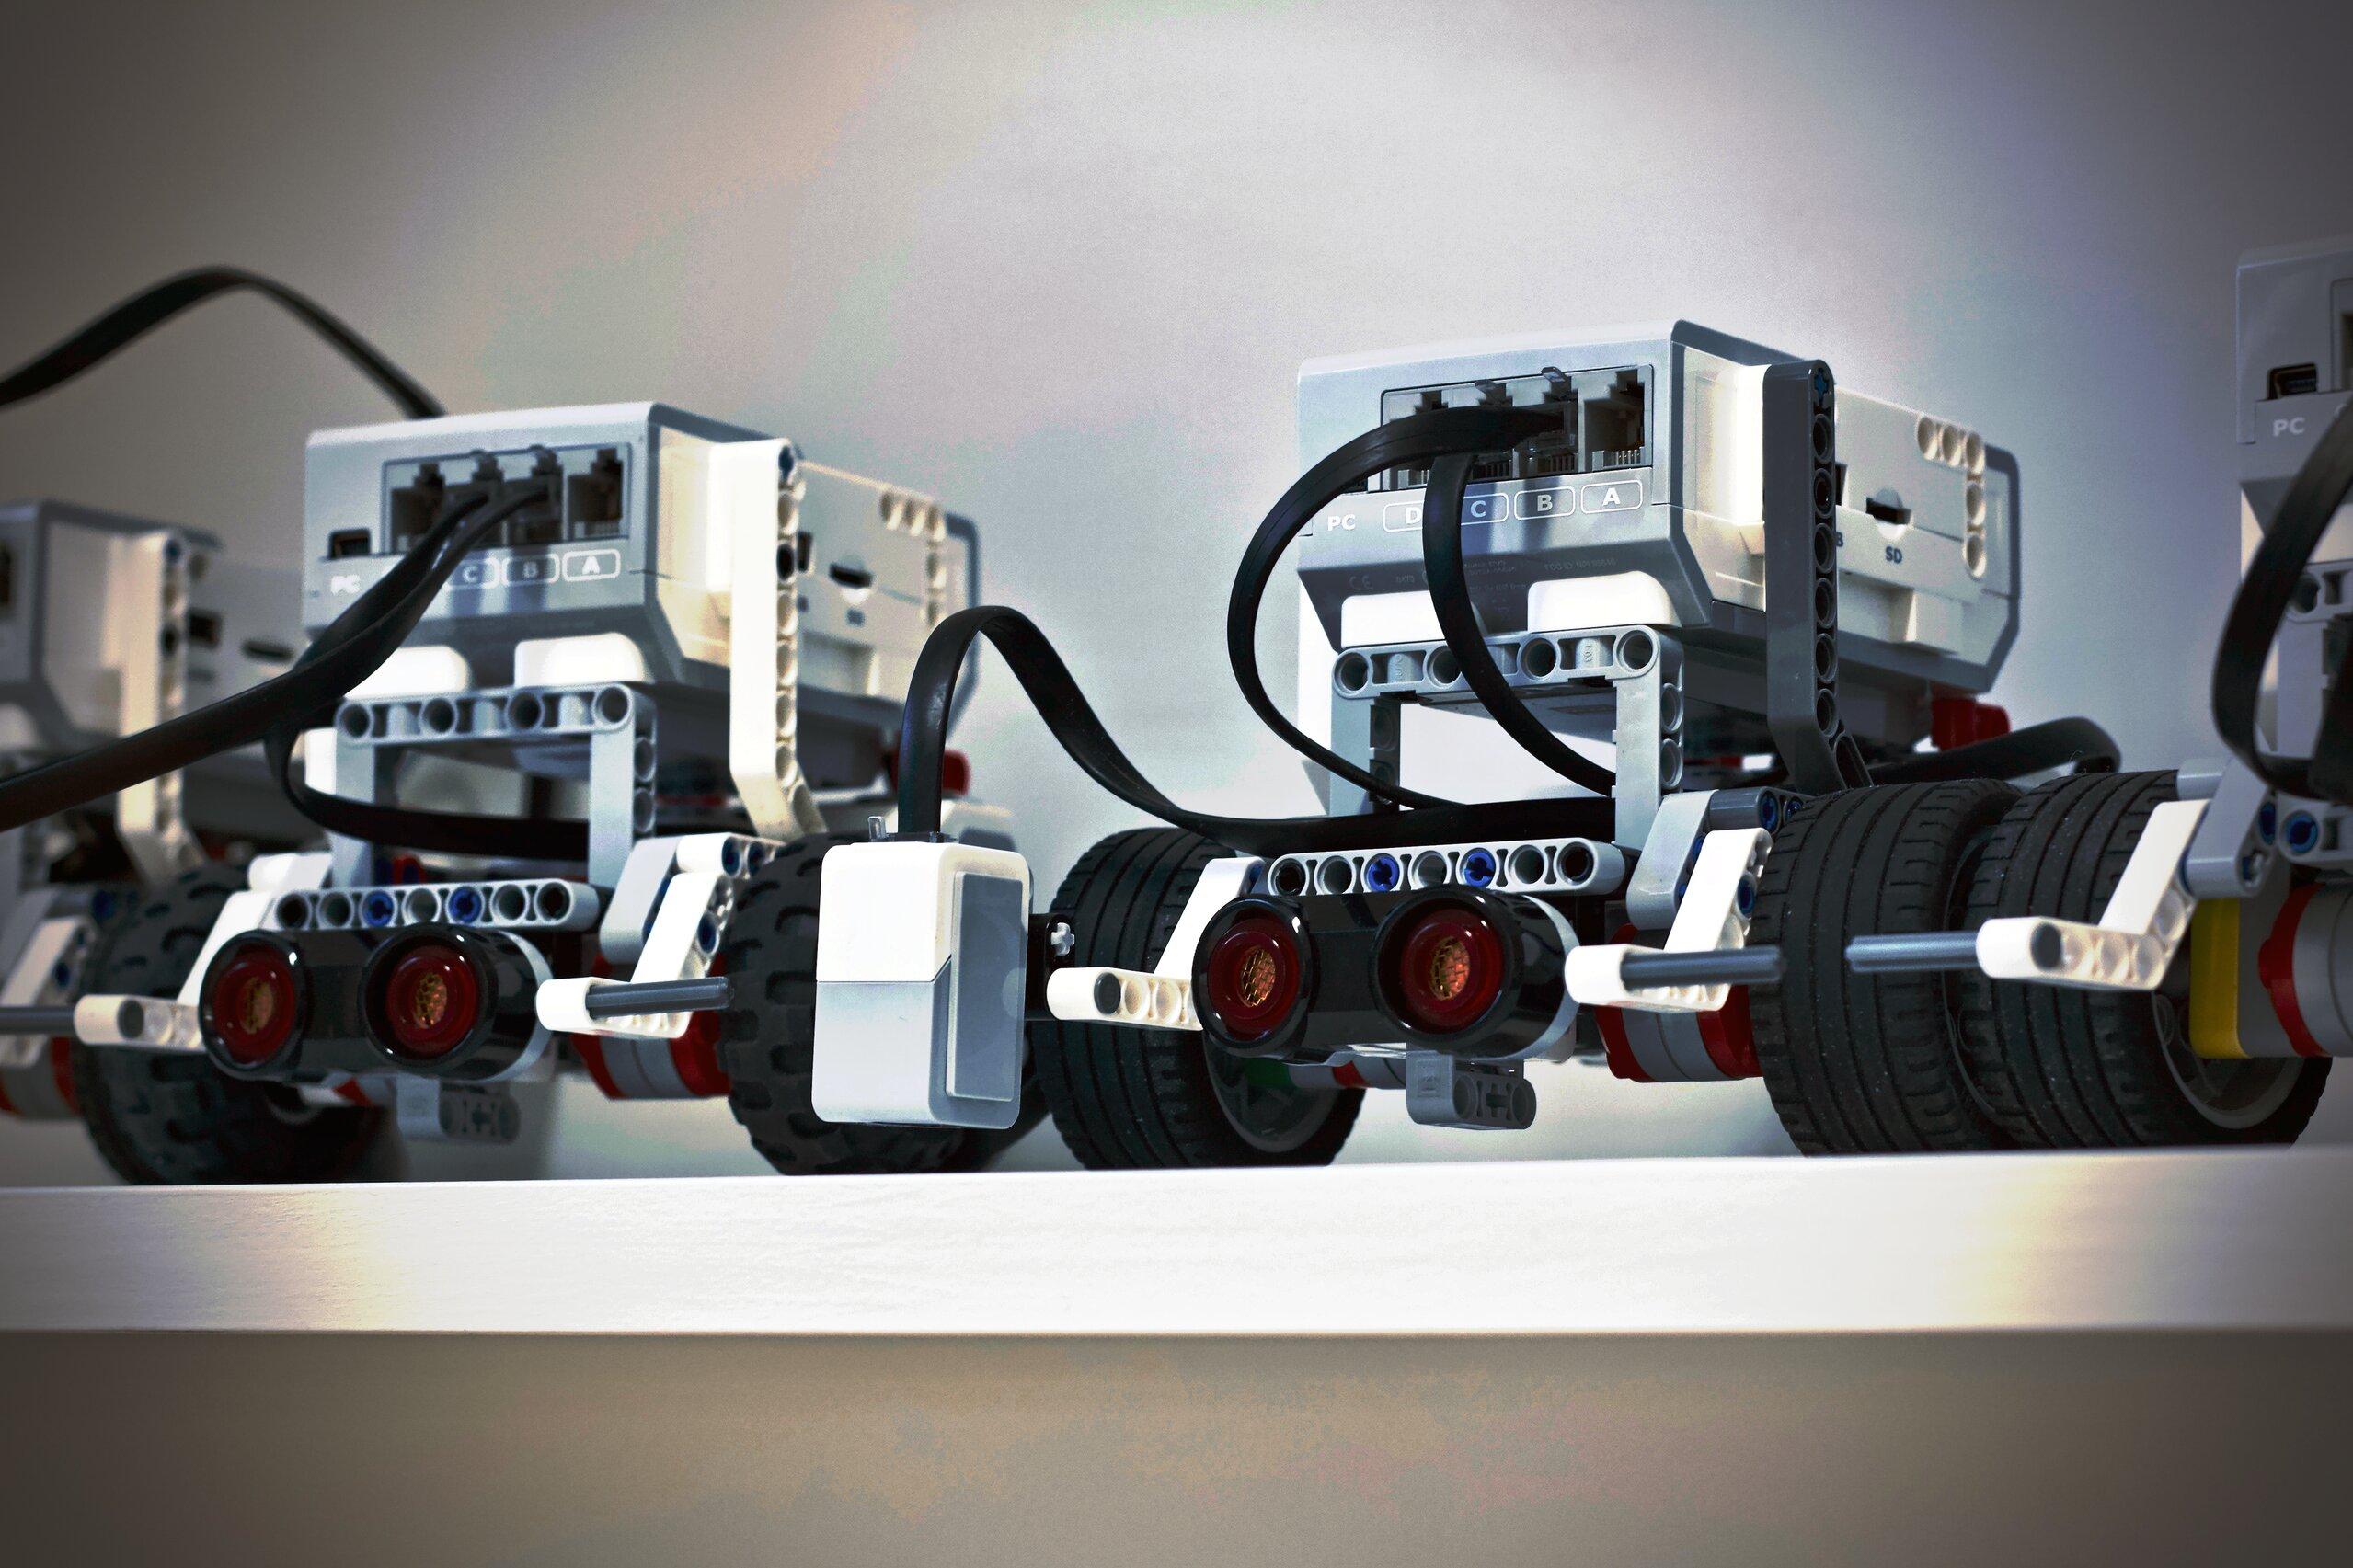 Mindstorms robots